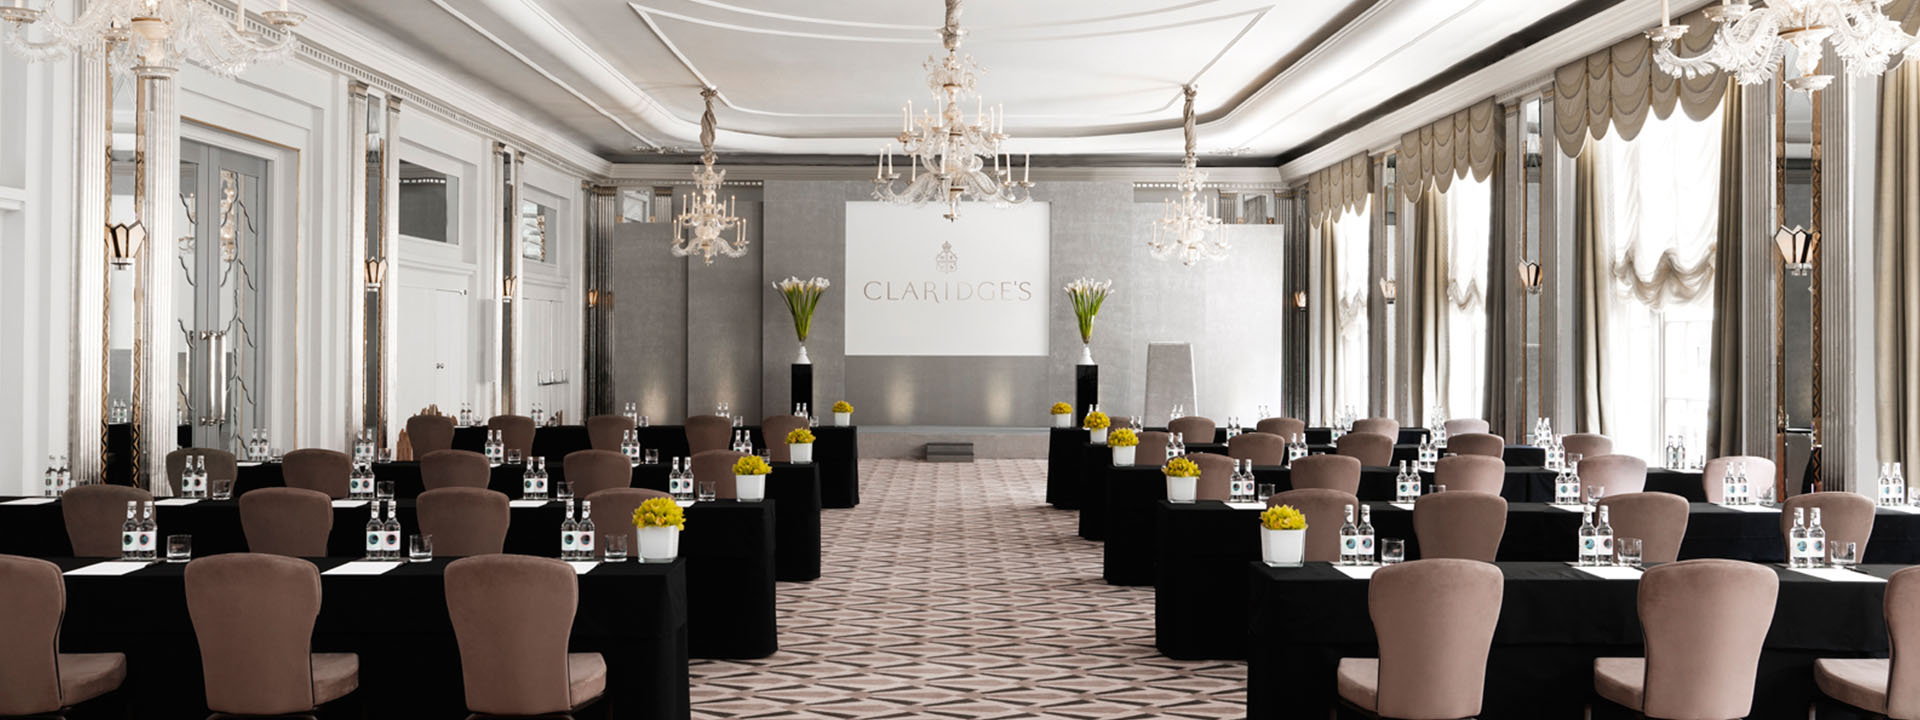 Ballroom corporate room at Claridge's